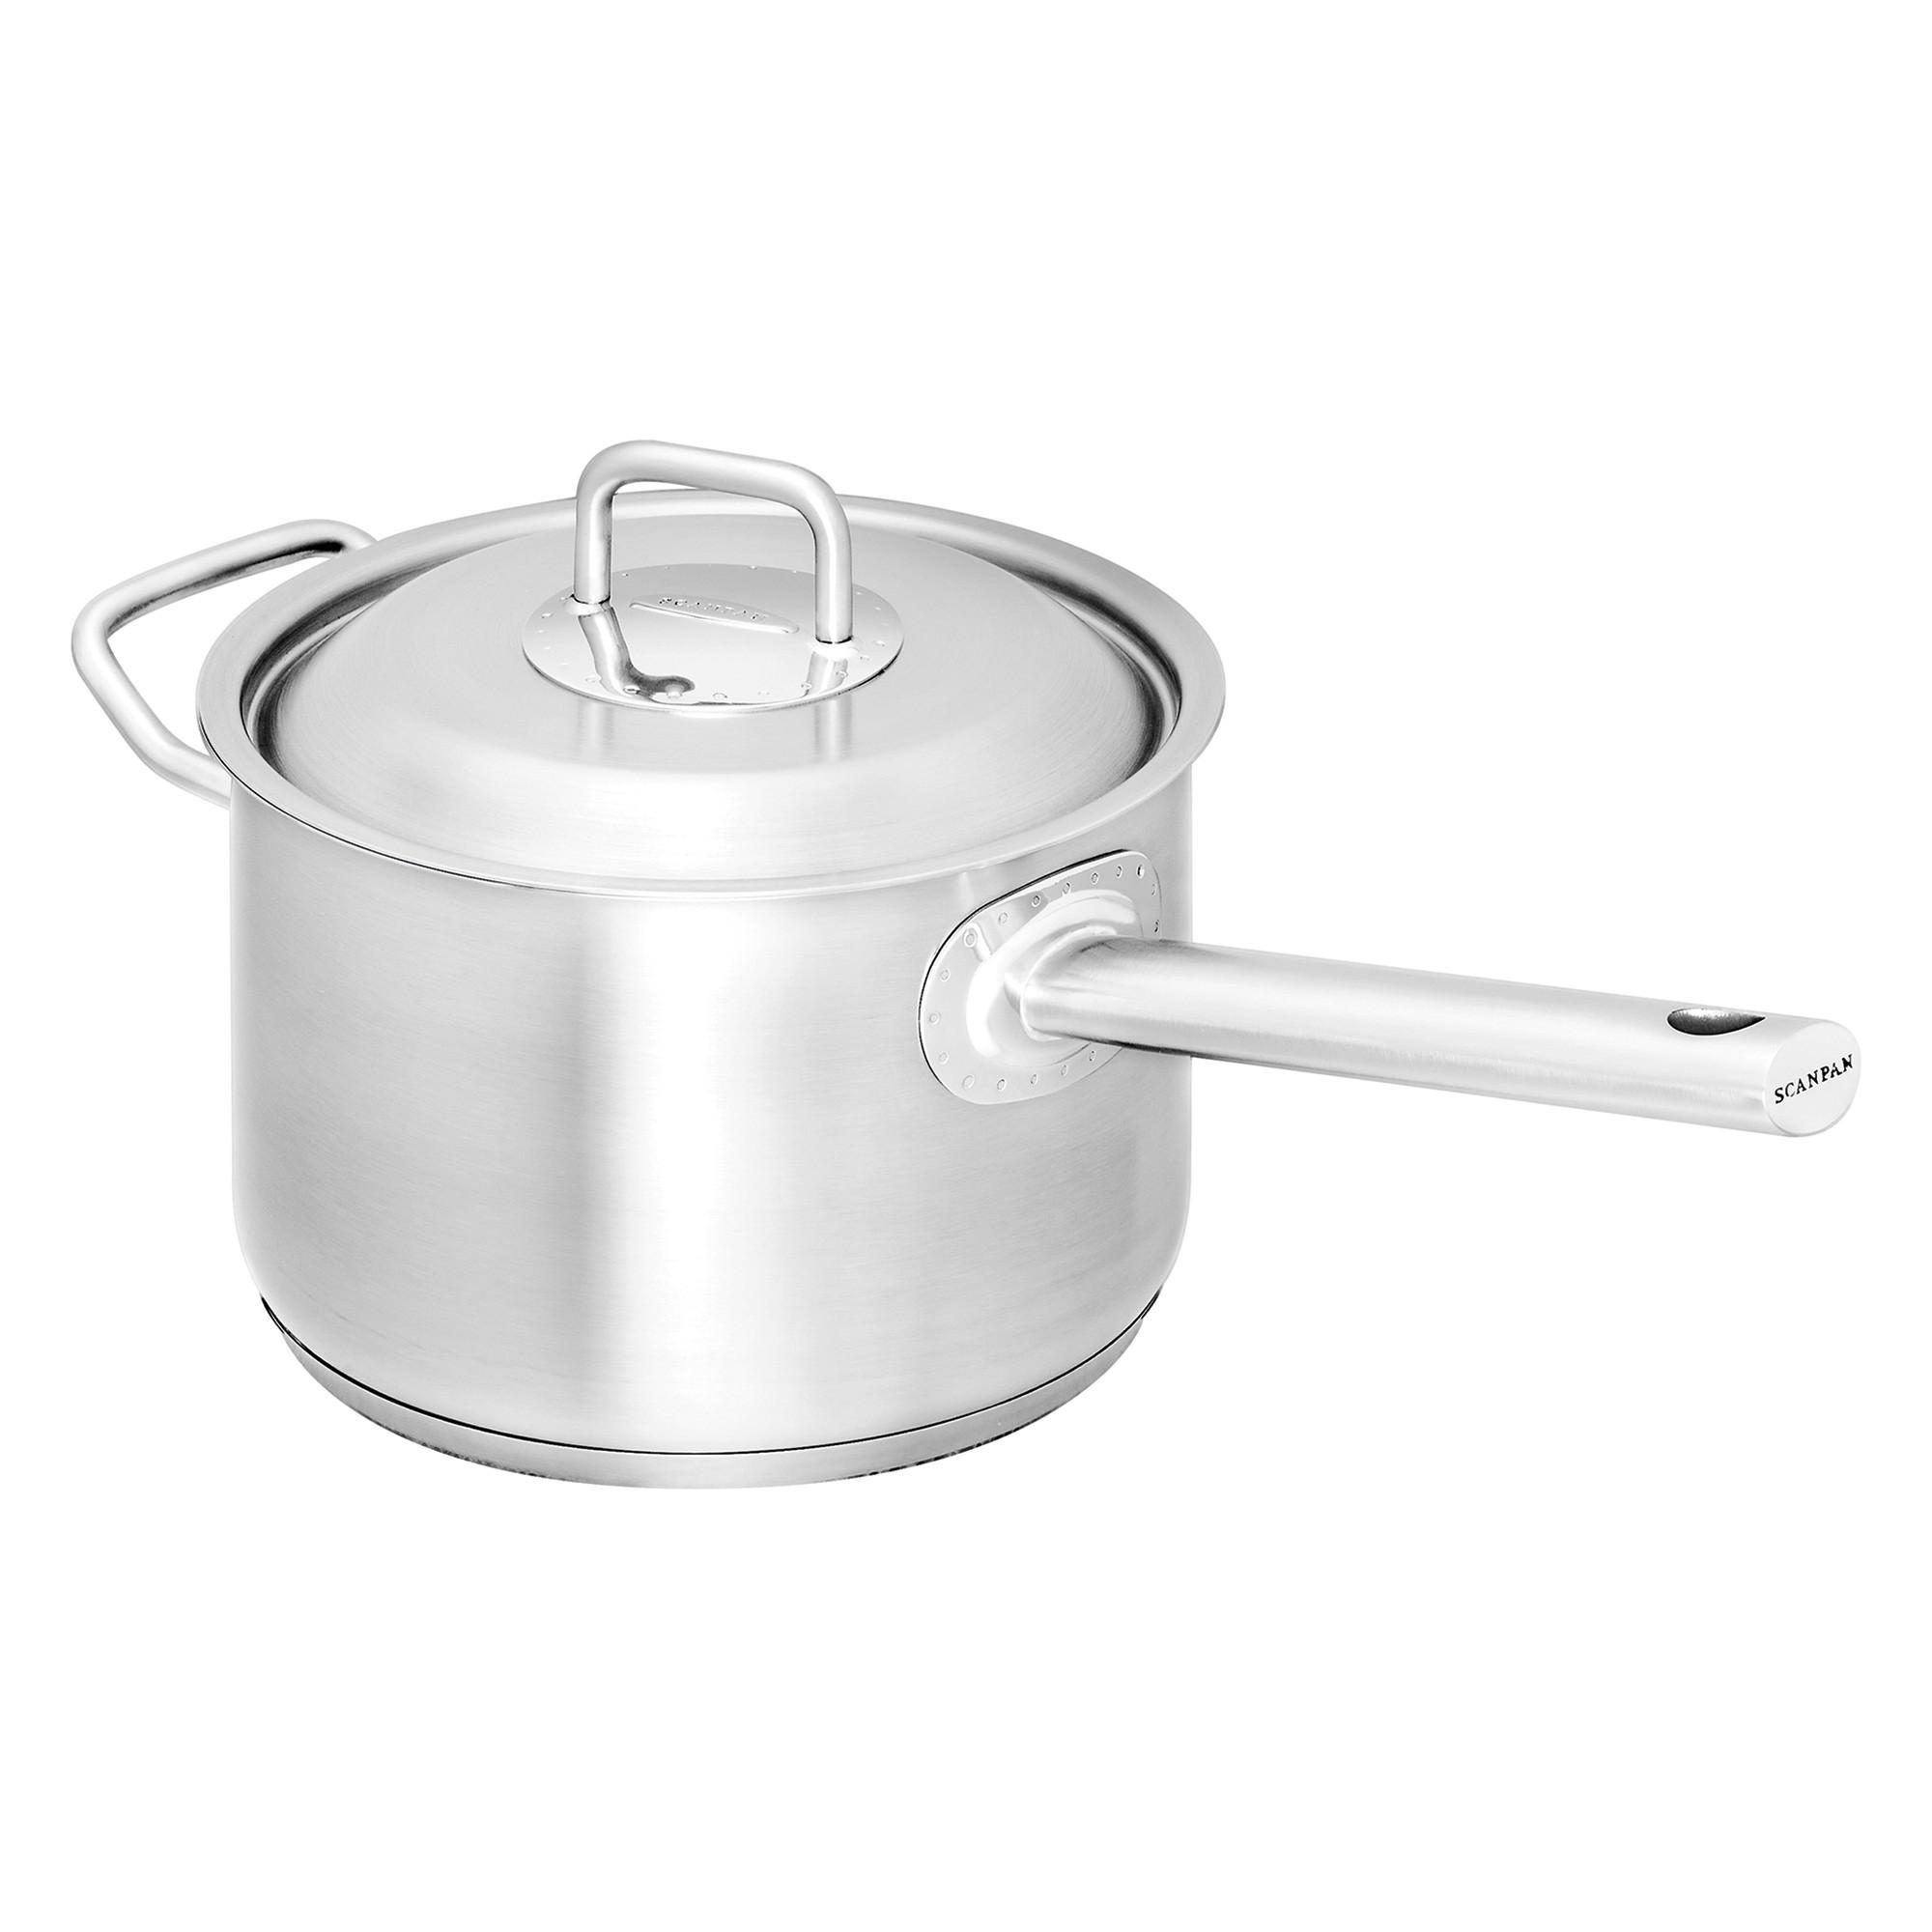 Scanpan Commercial 20cm/3.5L Saucepan